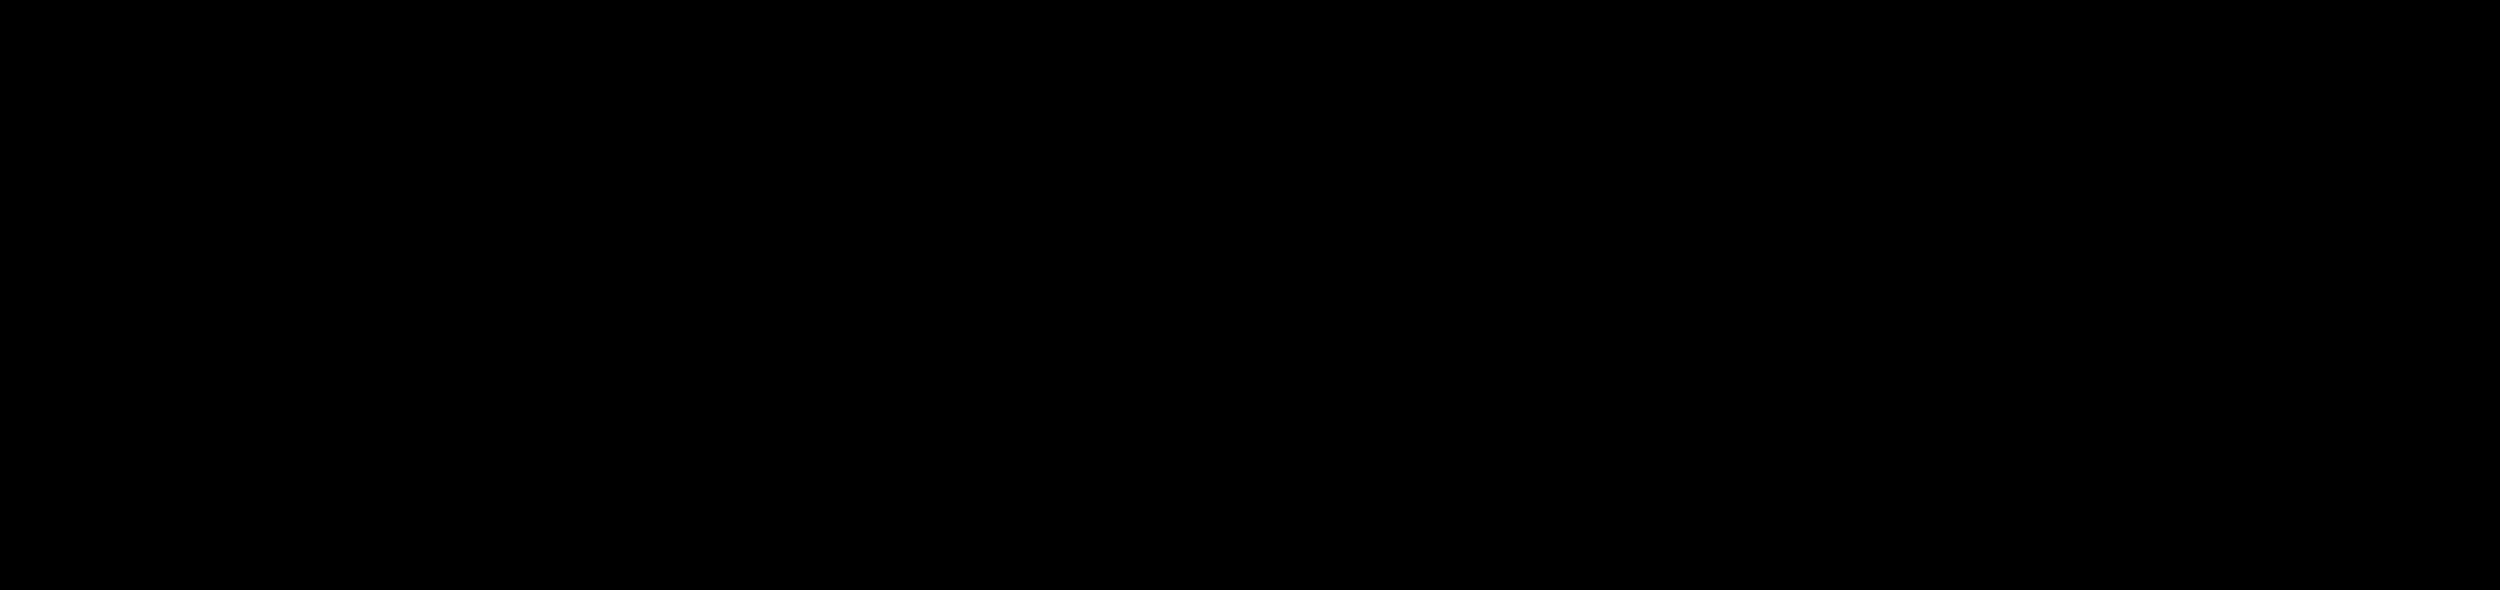 Logo Linear Black 5 1.8inch x 7.527 (2).png